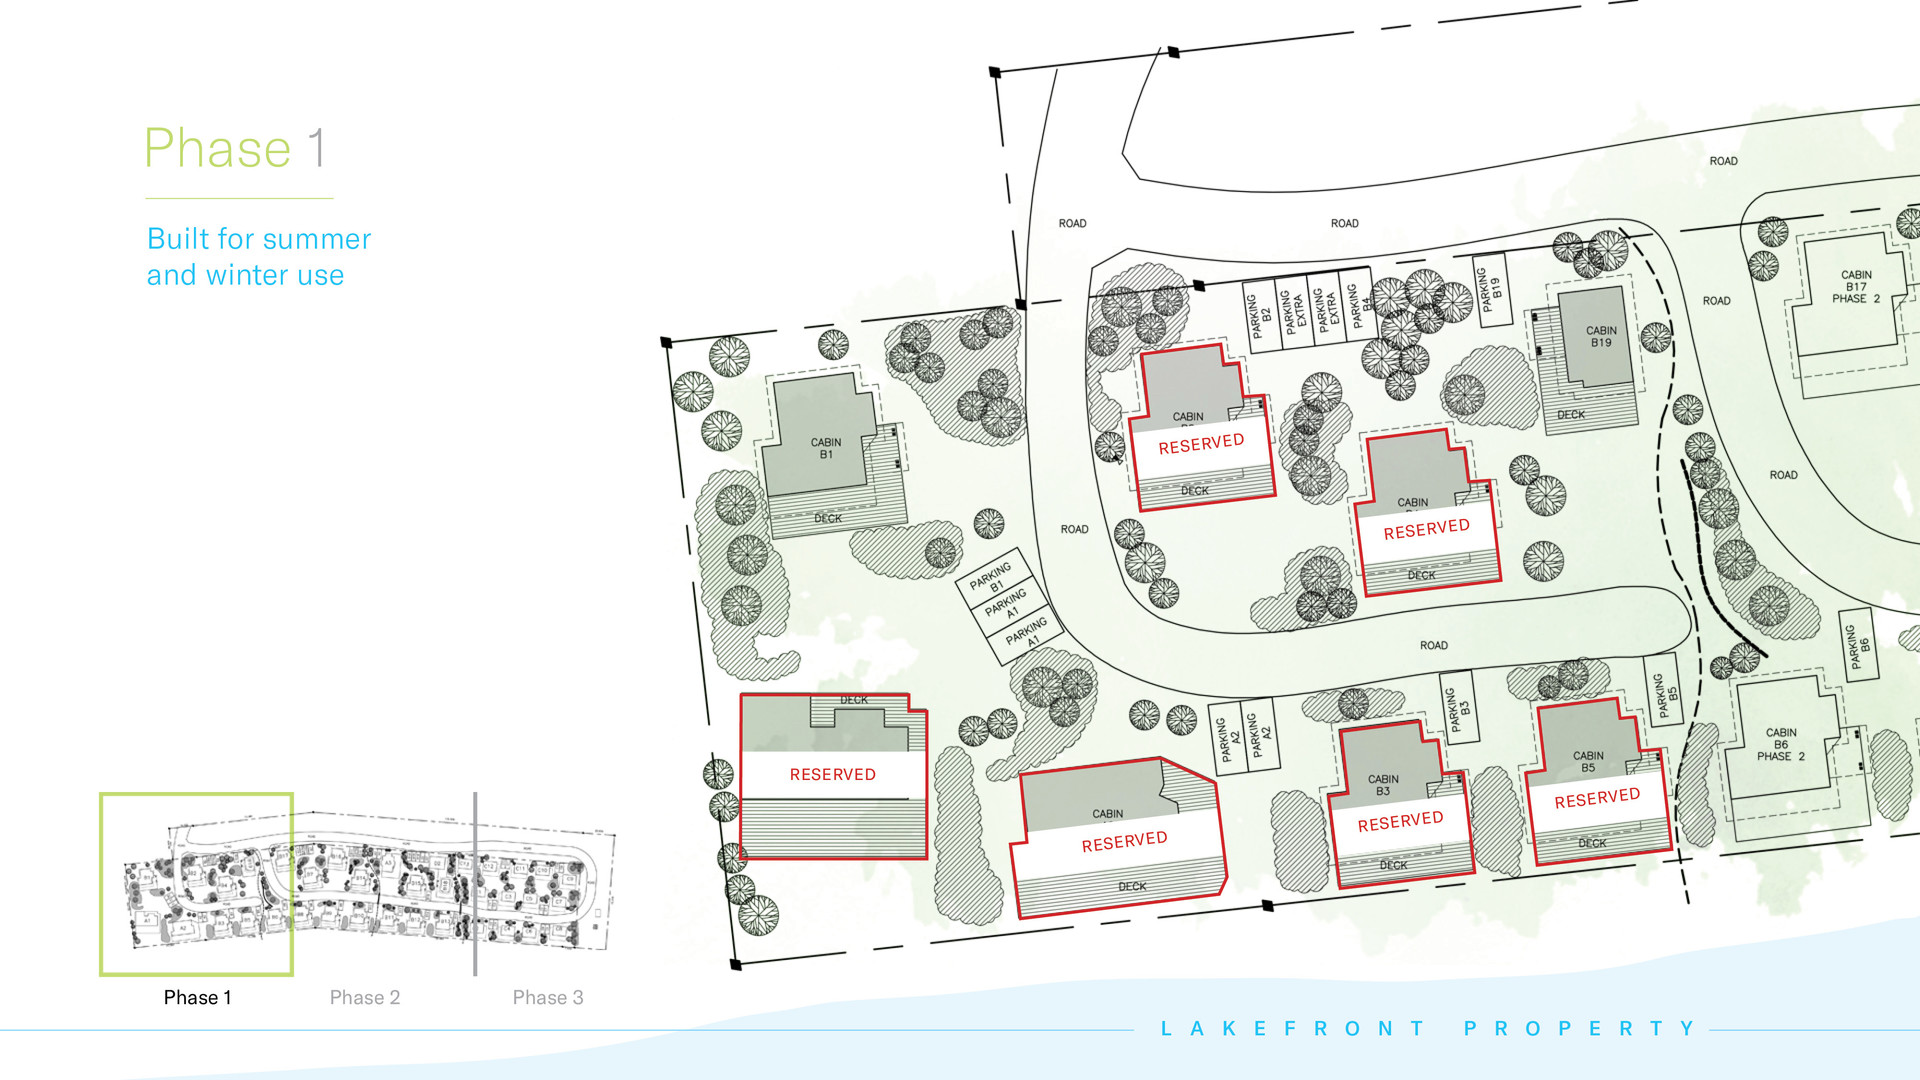 Kapasiwin Bungalows - Phase 1 Development